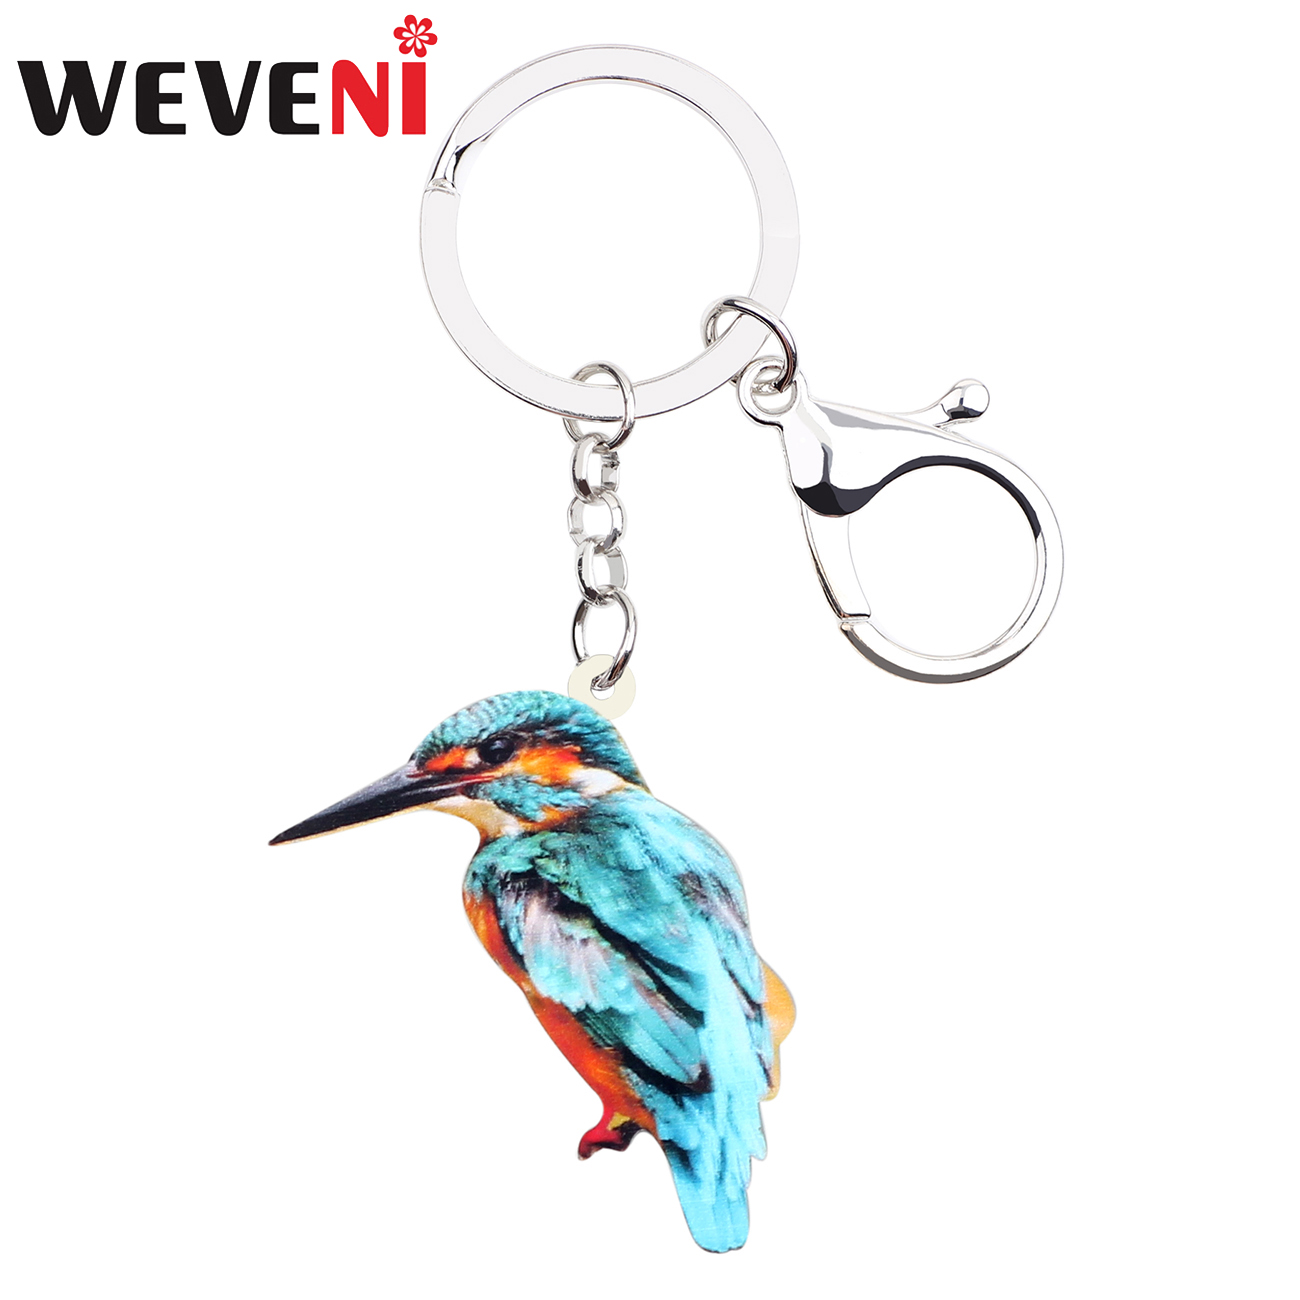 WEVENI Statement Acrylic Cute Kingfisher Bird Key Chains Keychains Holders Animal Jewelry Gift For Women Girls Bag Car Charms